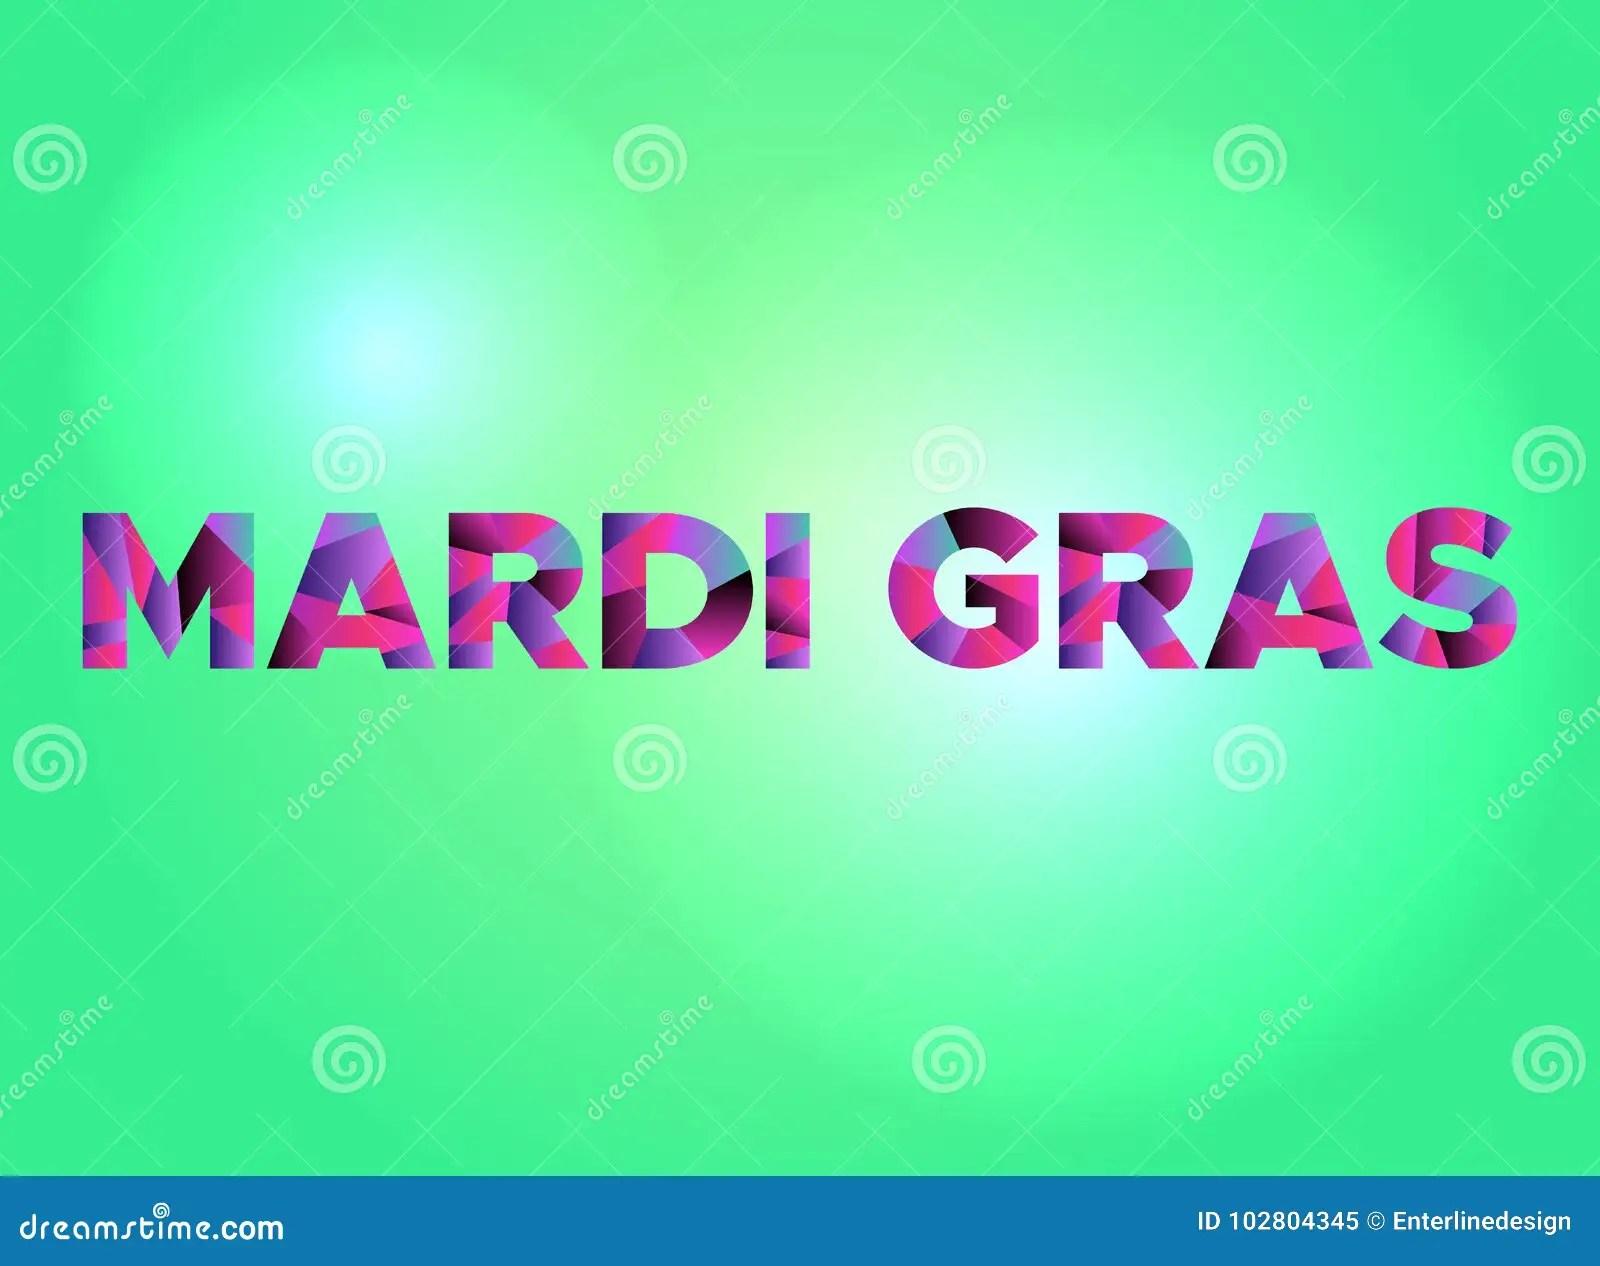 Mardi Gras Concept Colorful Word Art Illustration Stock